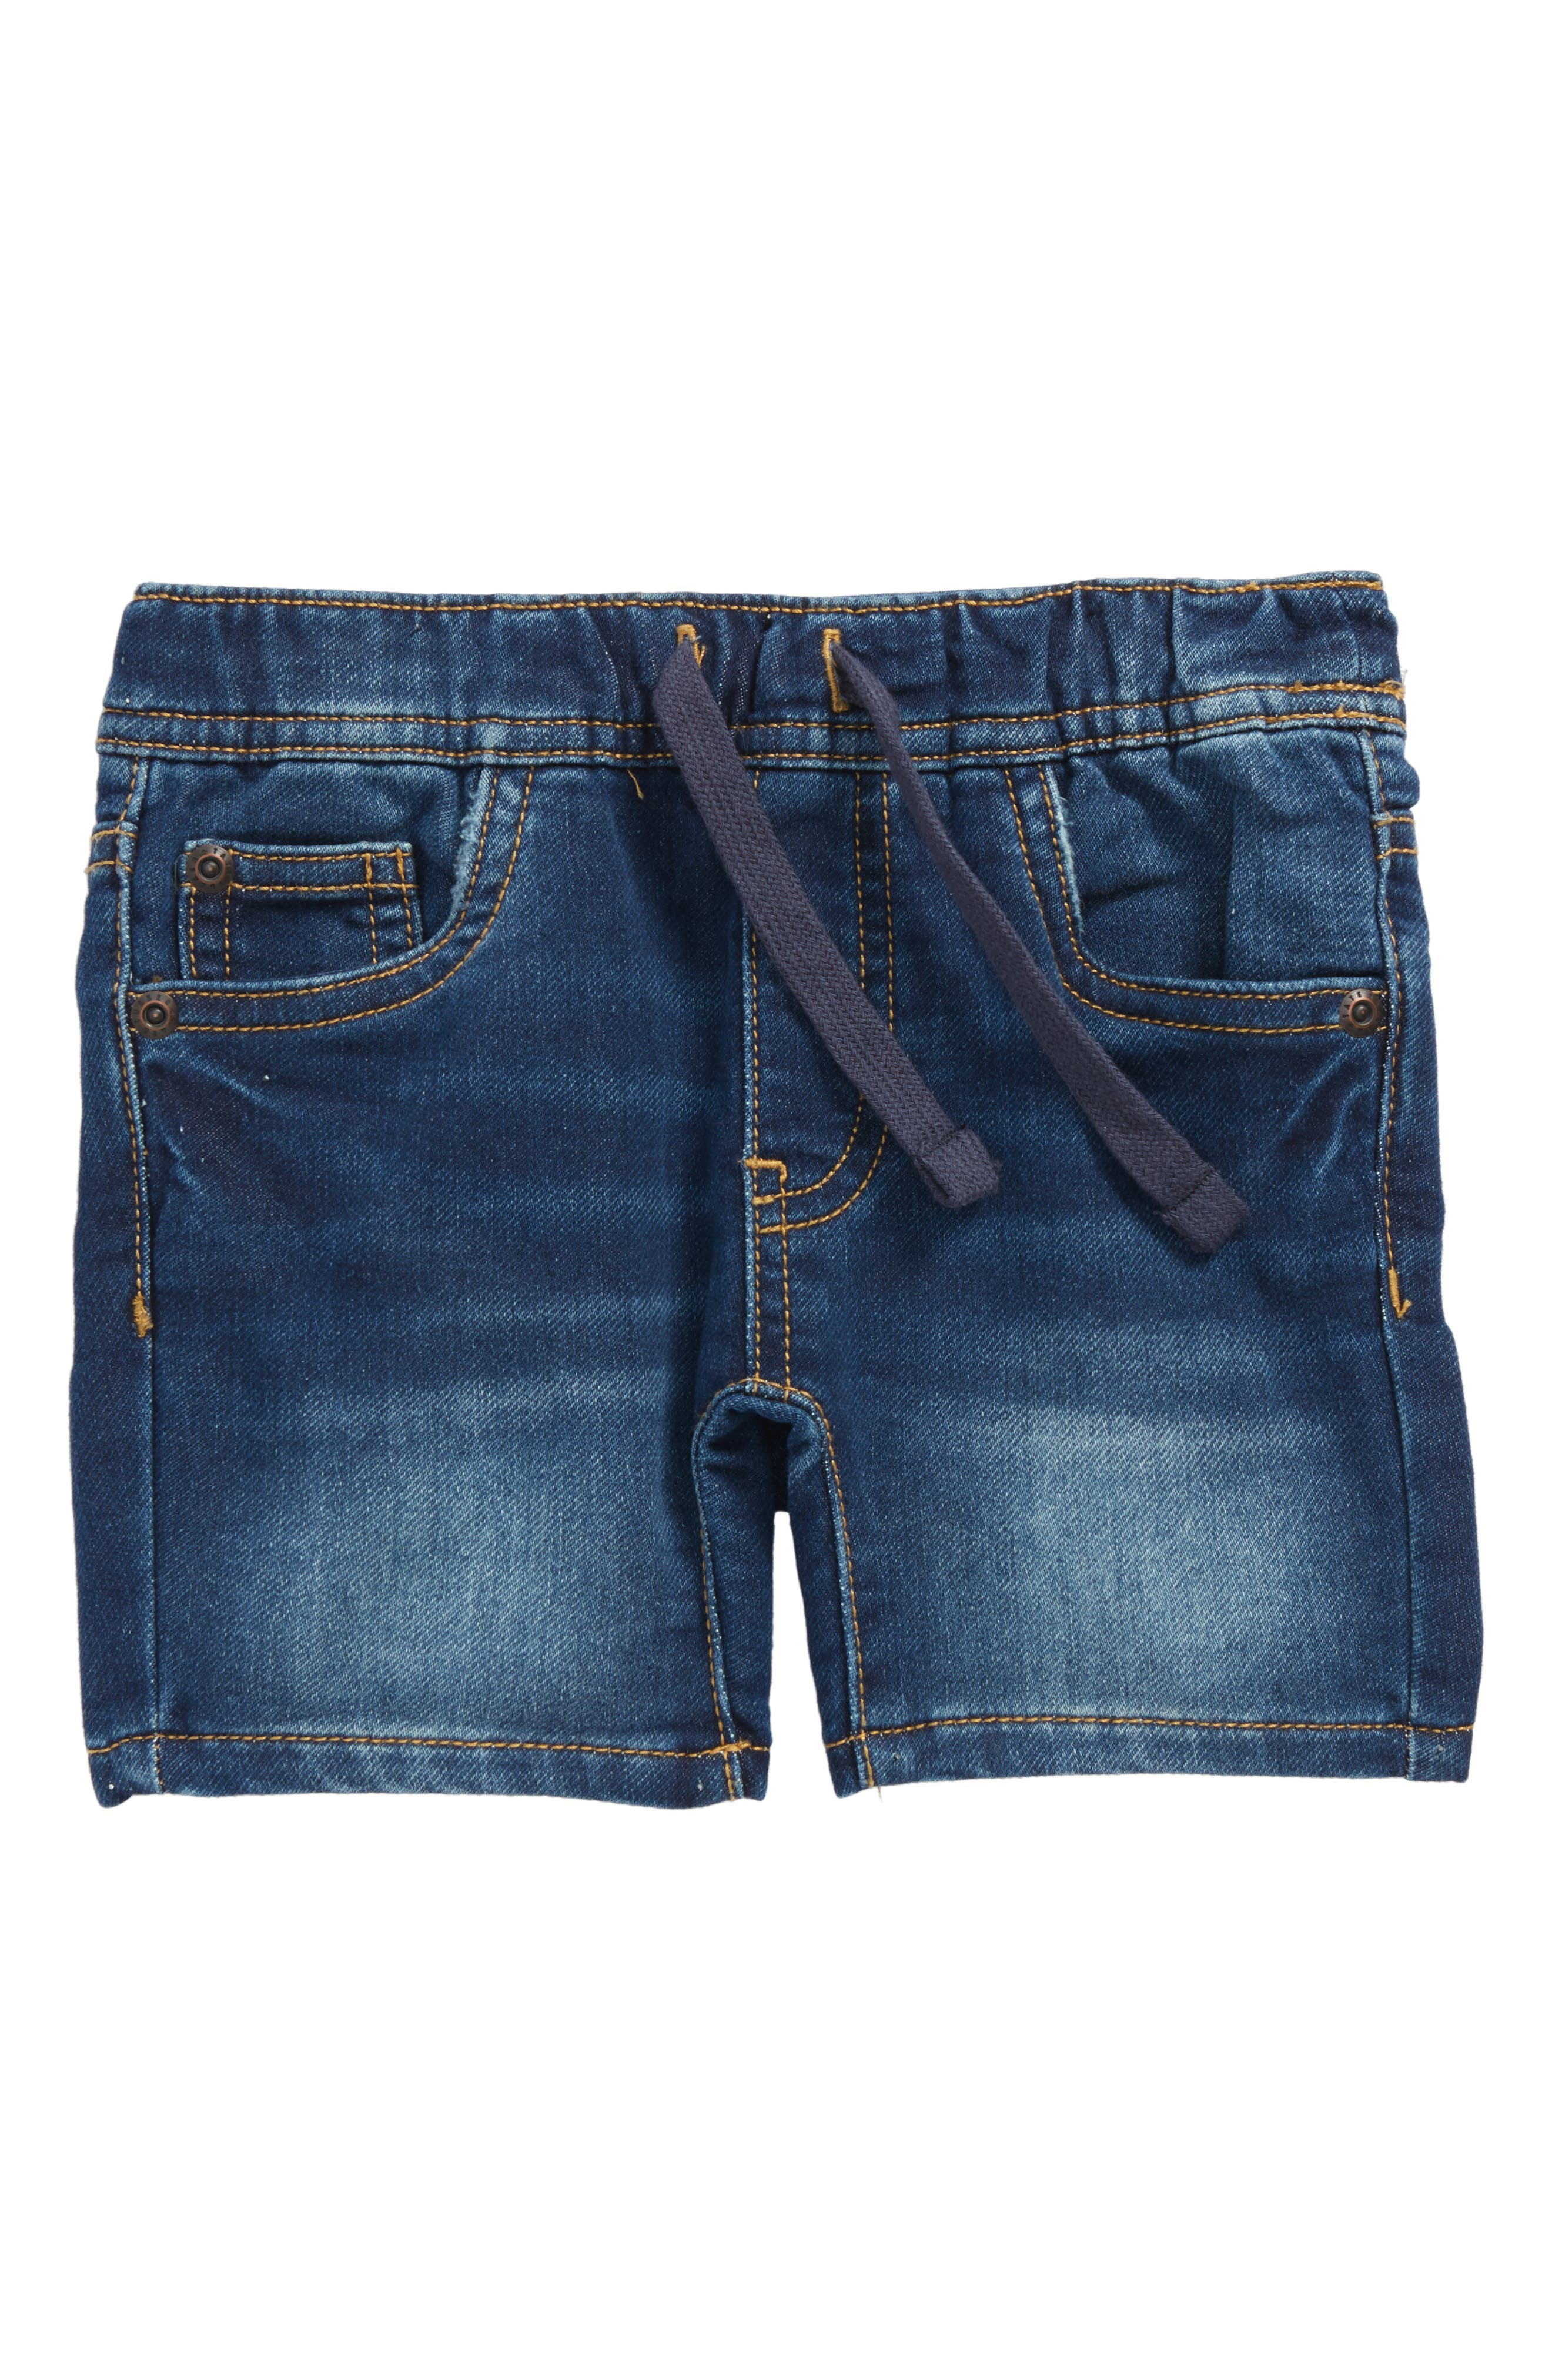 Denim Shorts,                         Main,                         color, Bale Wash